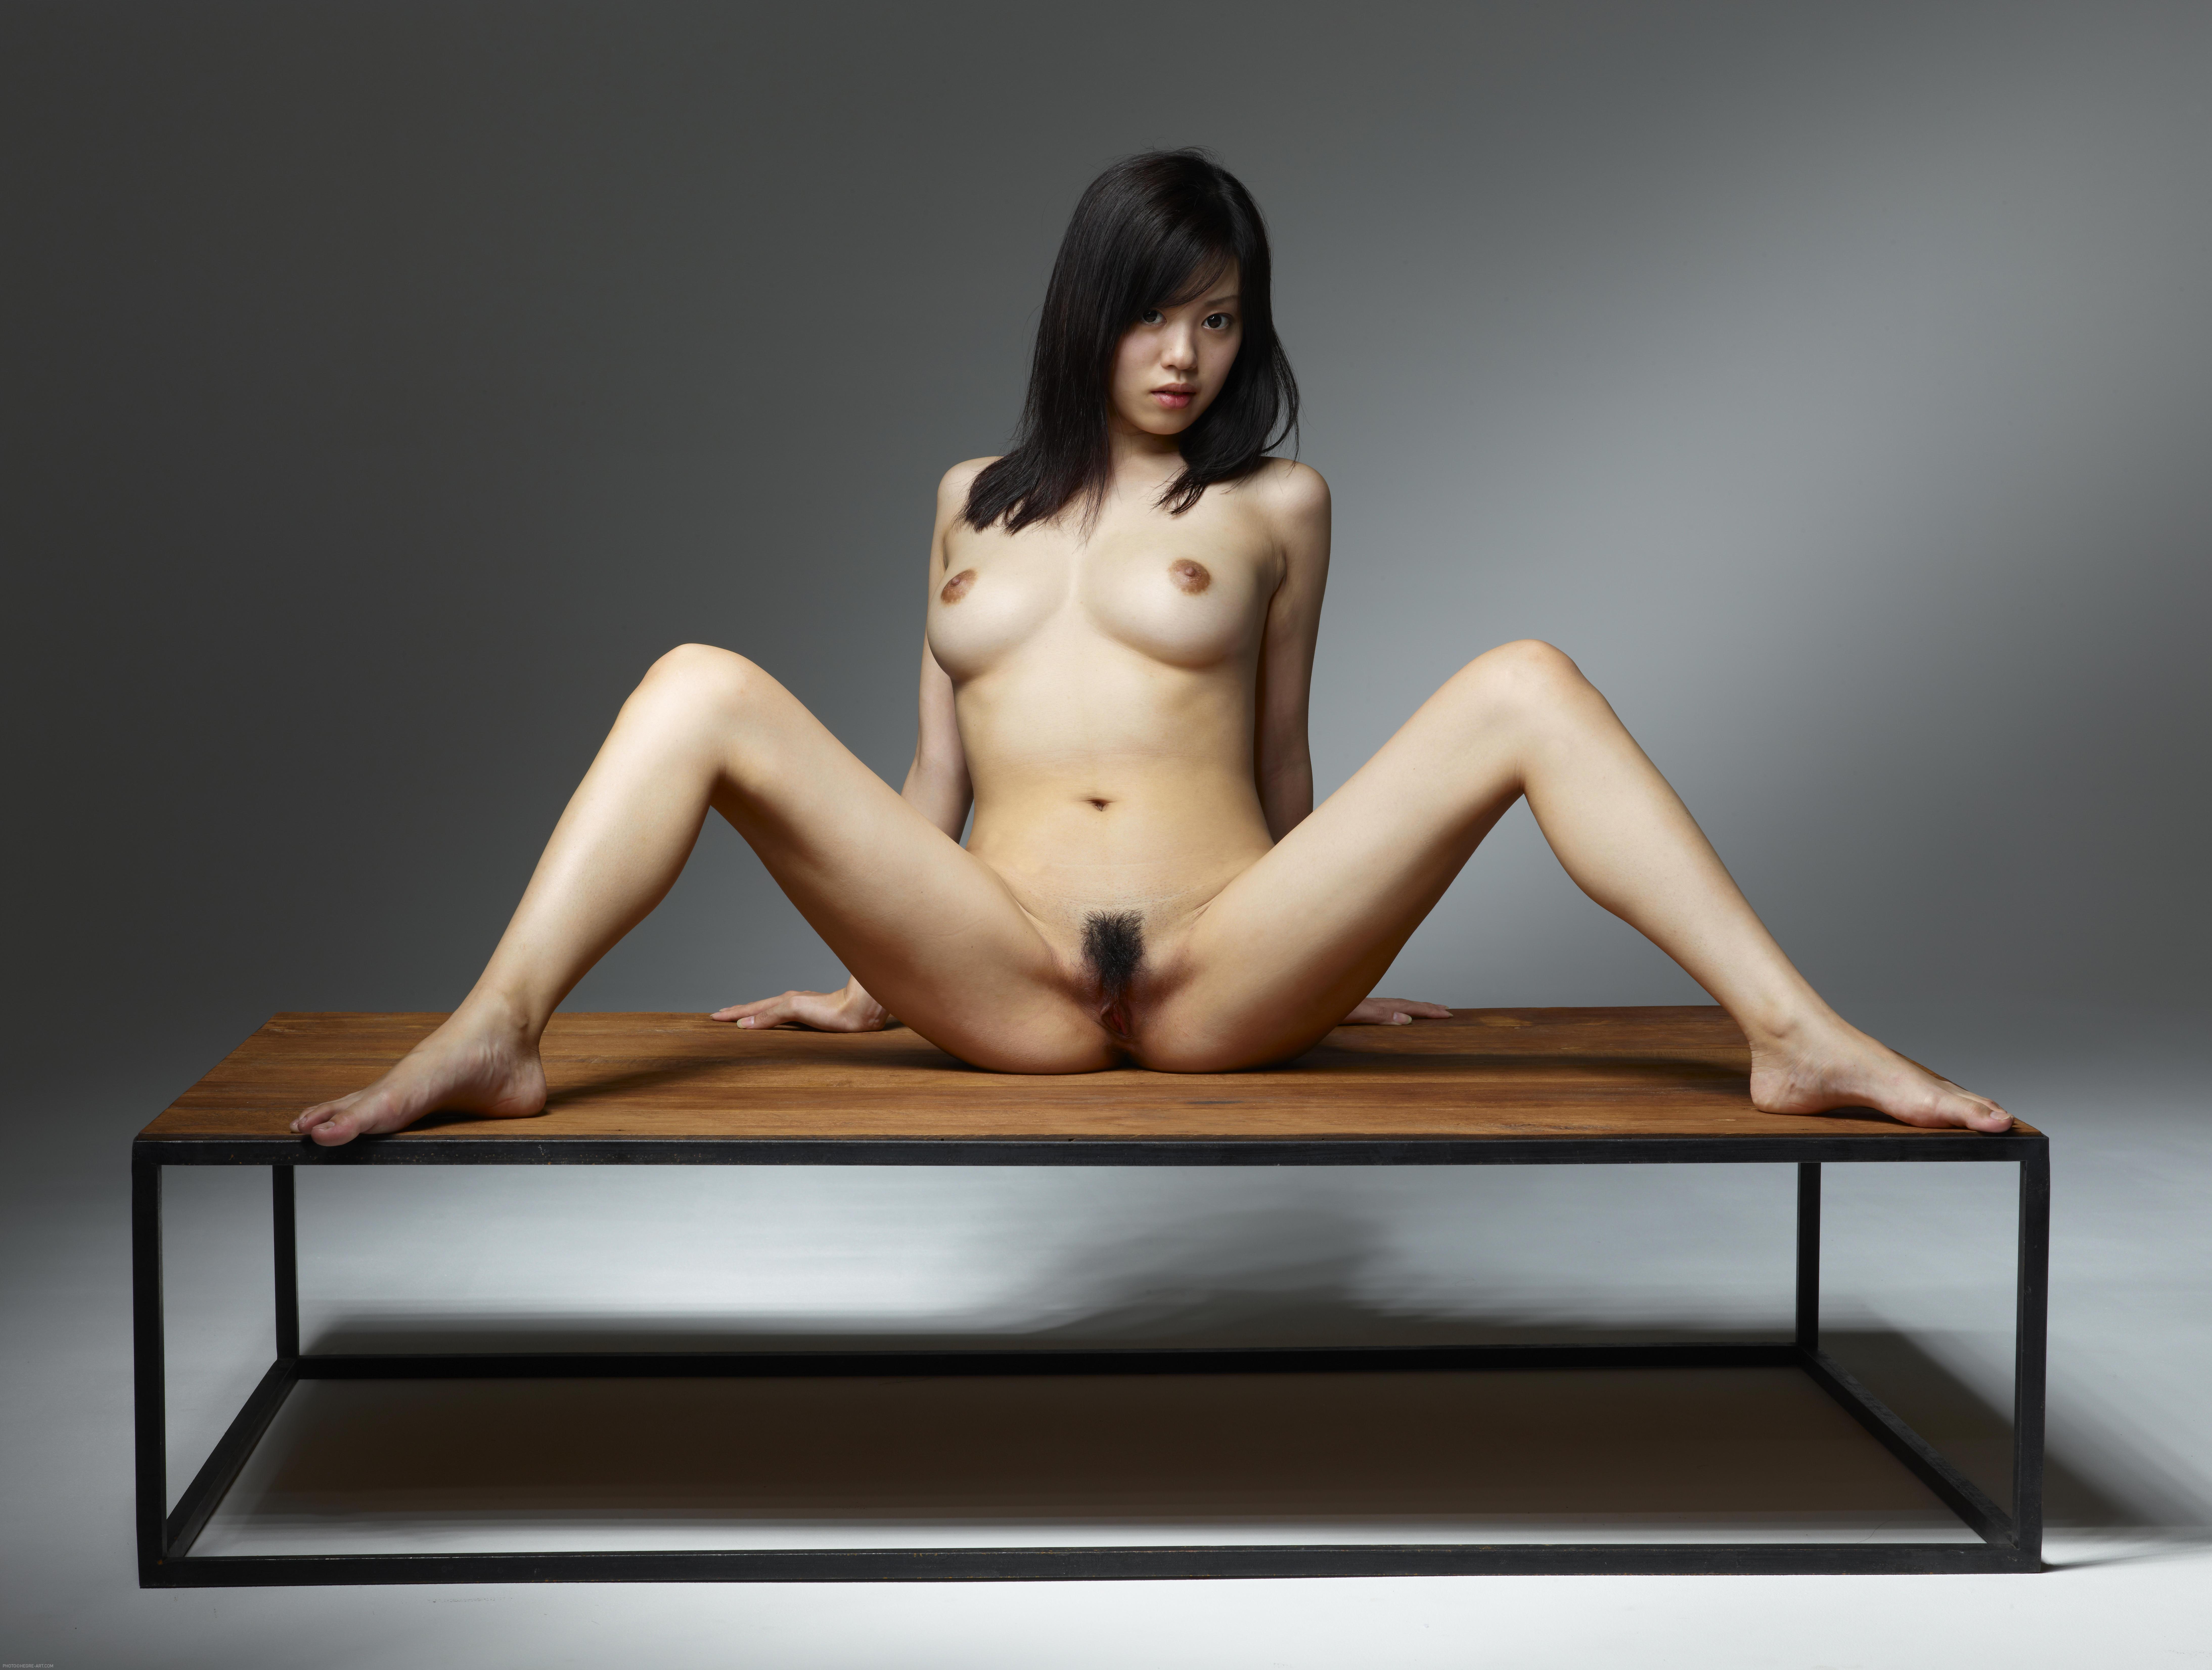 hegre-art.com konata